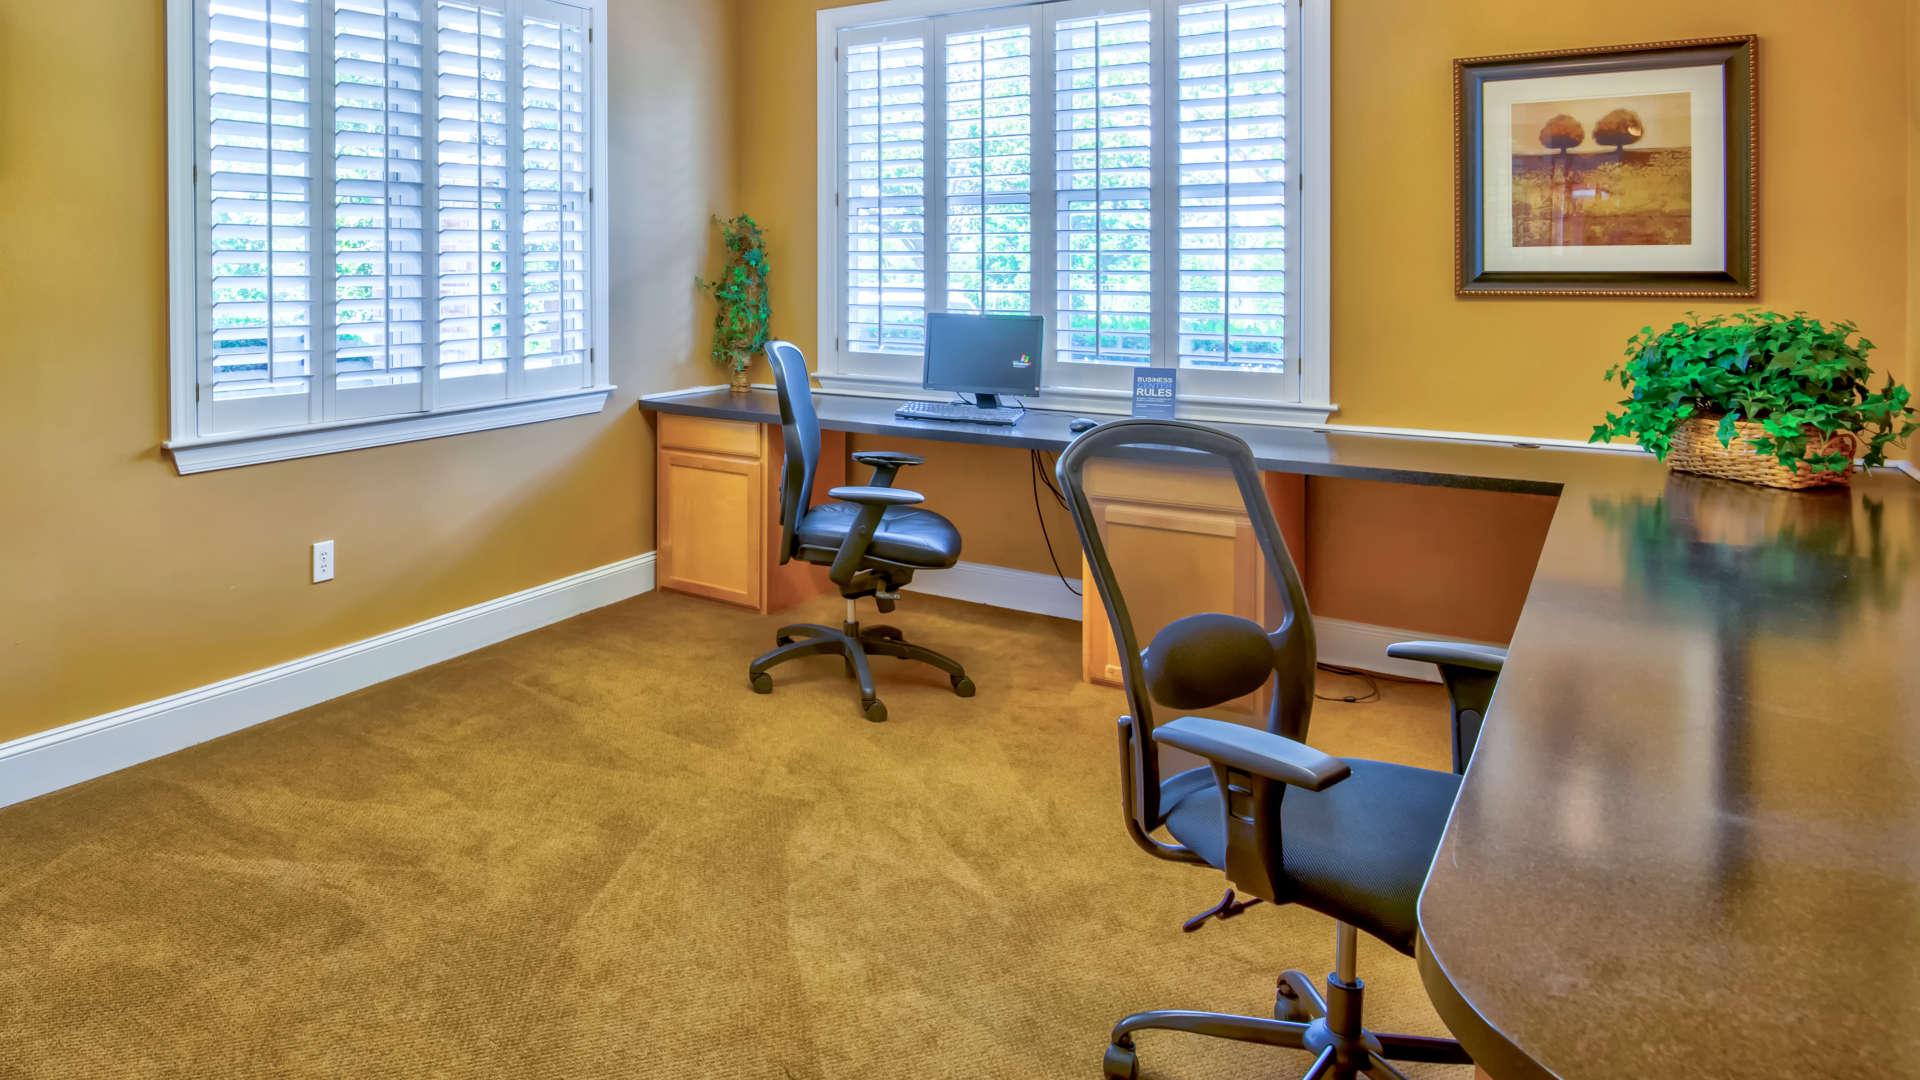 Computer room at 200 East in Durham, North Carolina